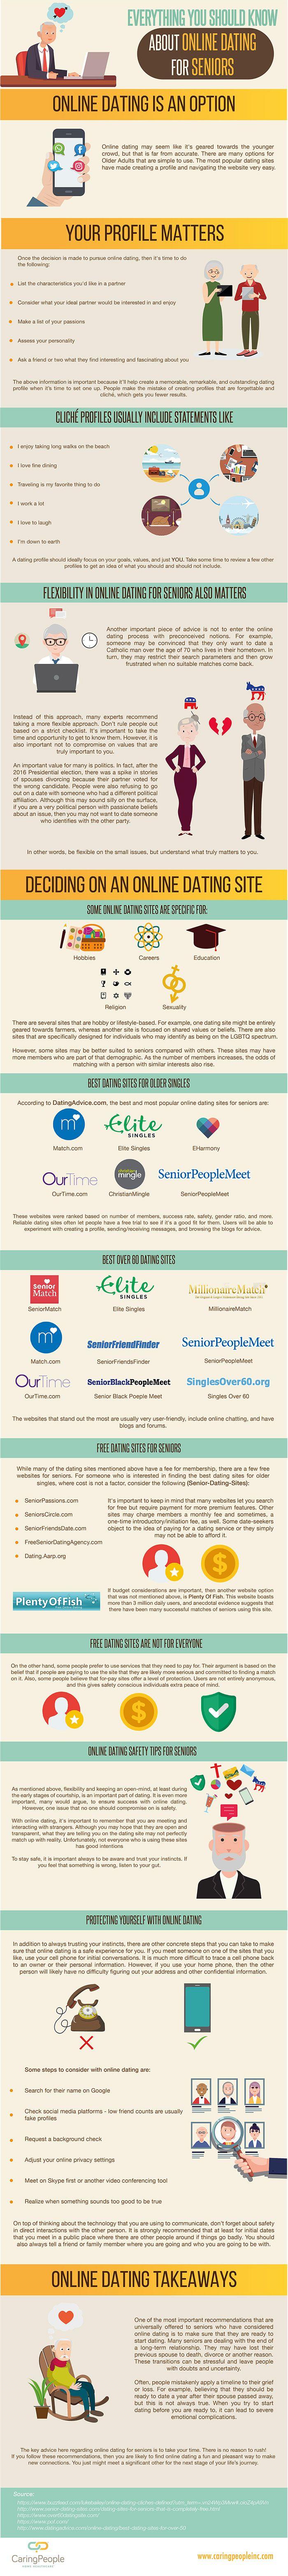 list of most popular dating websites